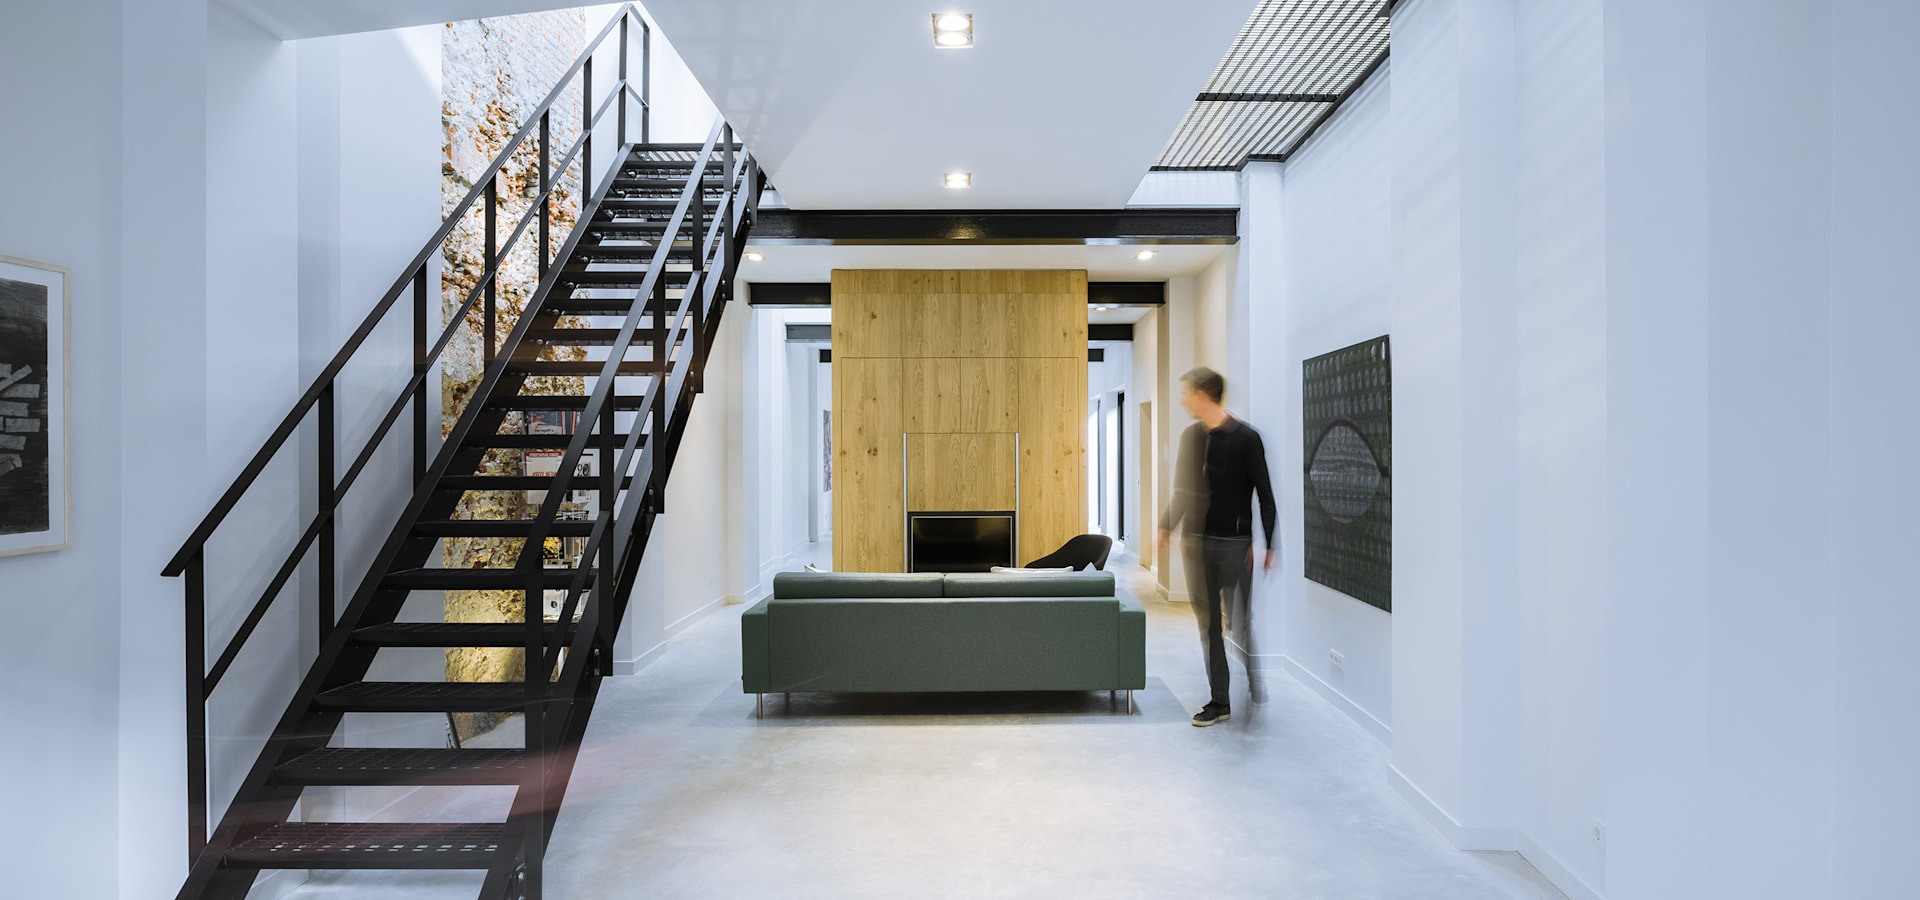 EVA architecten